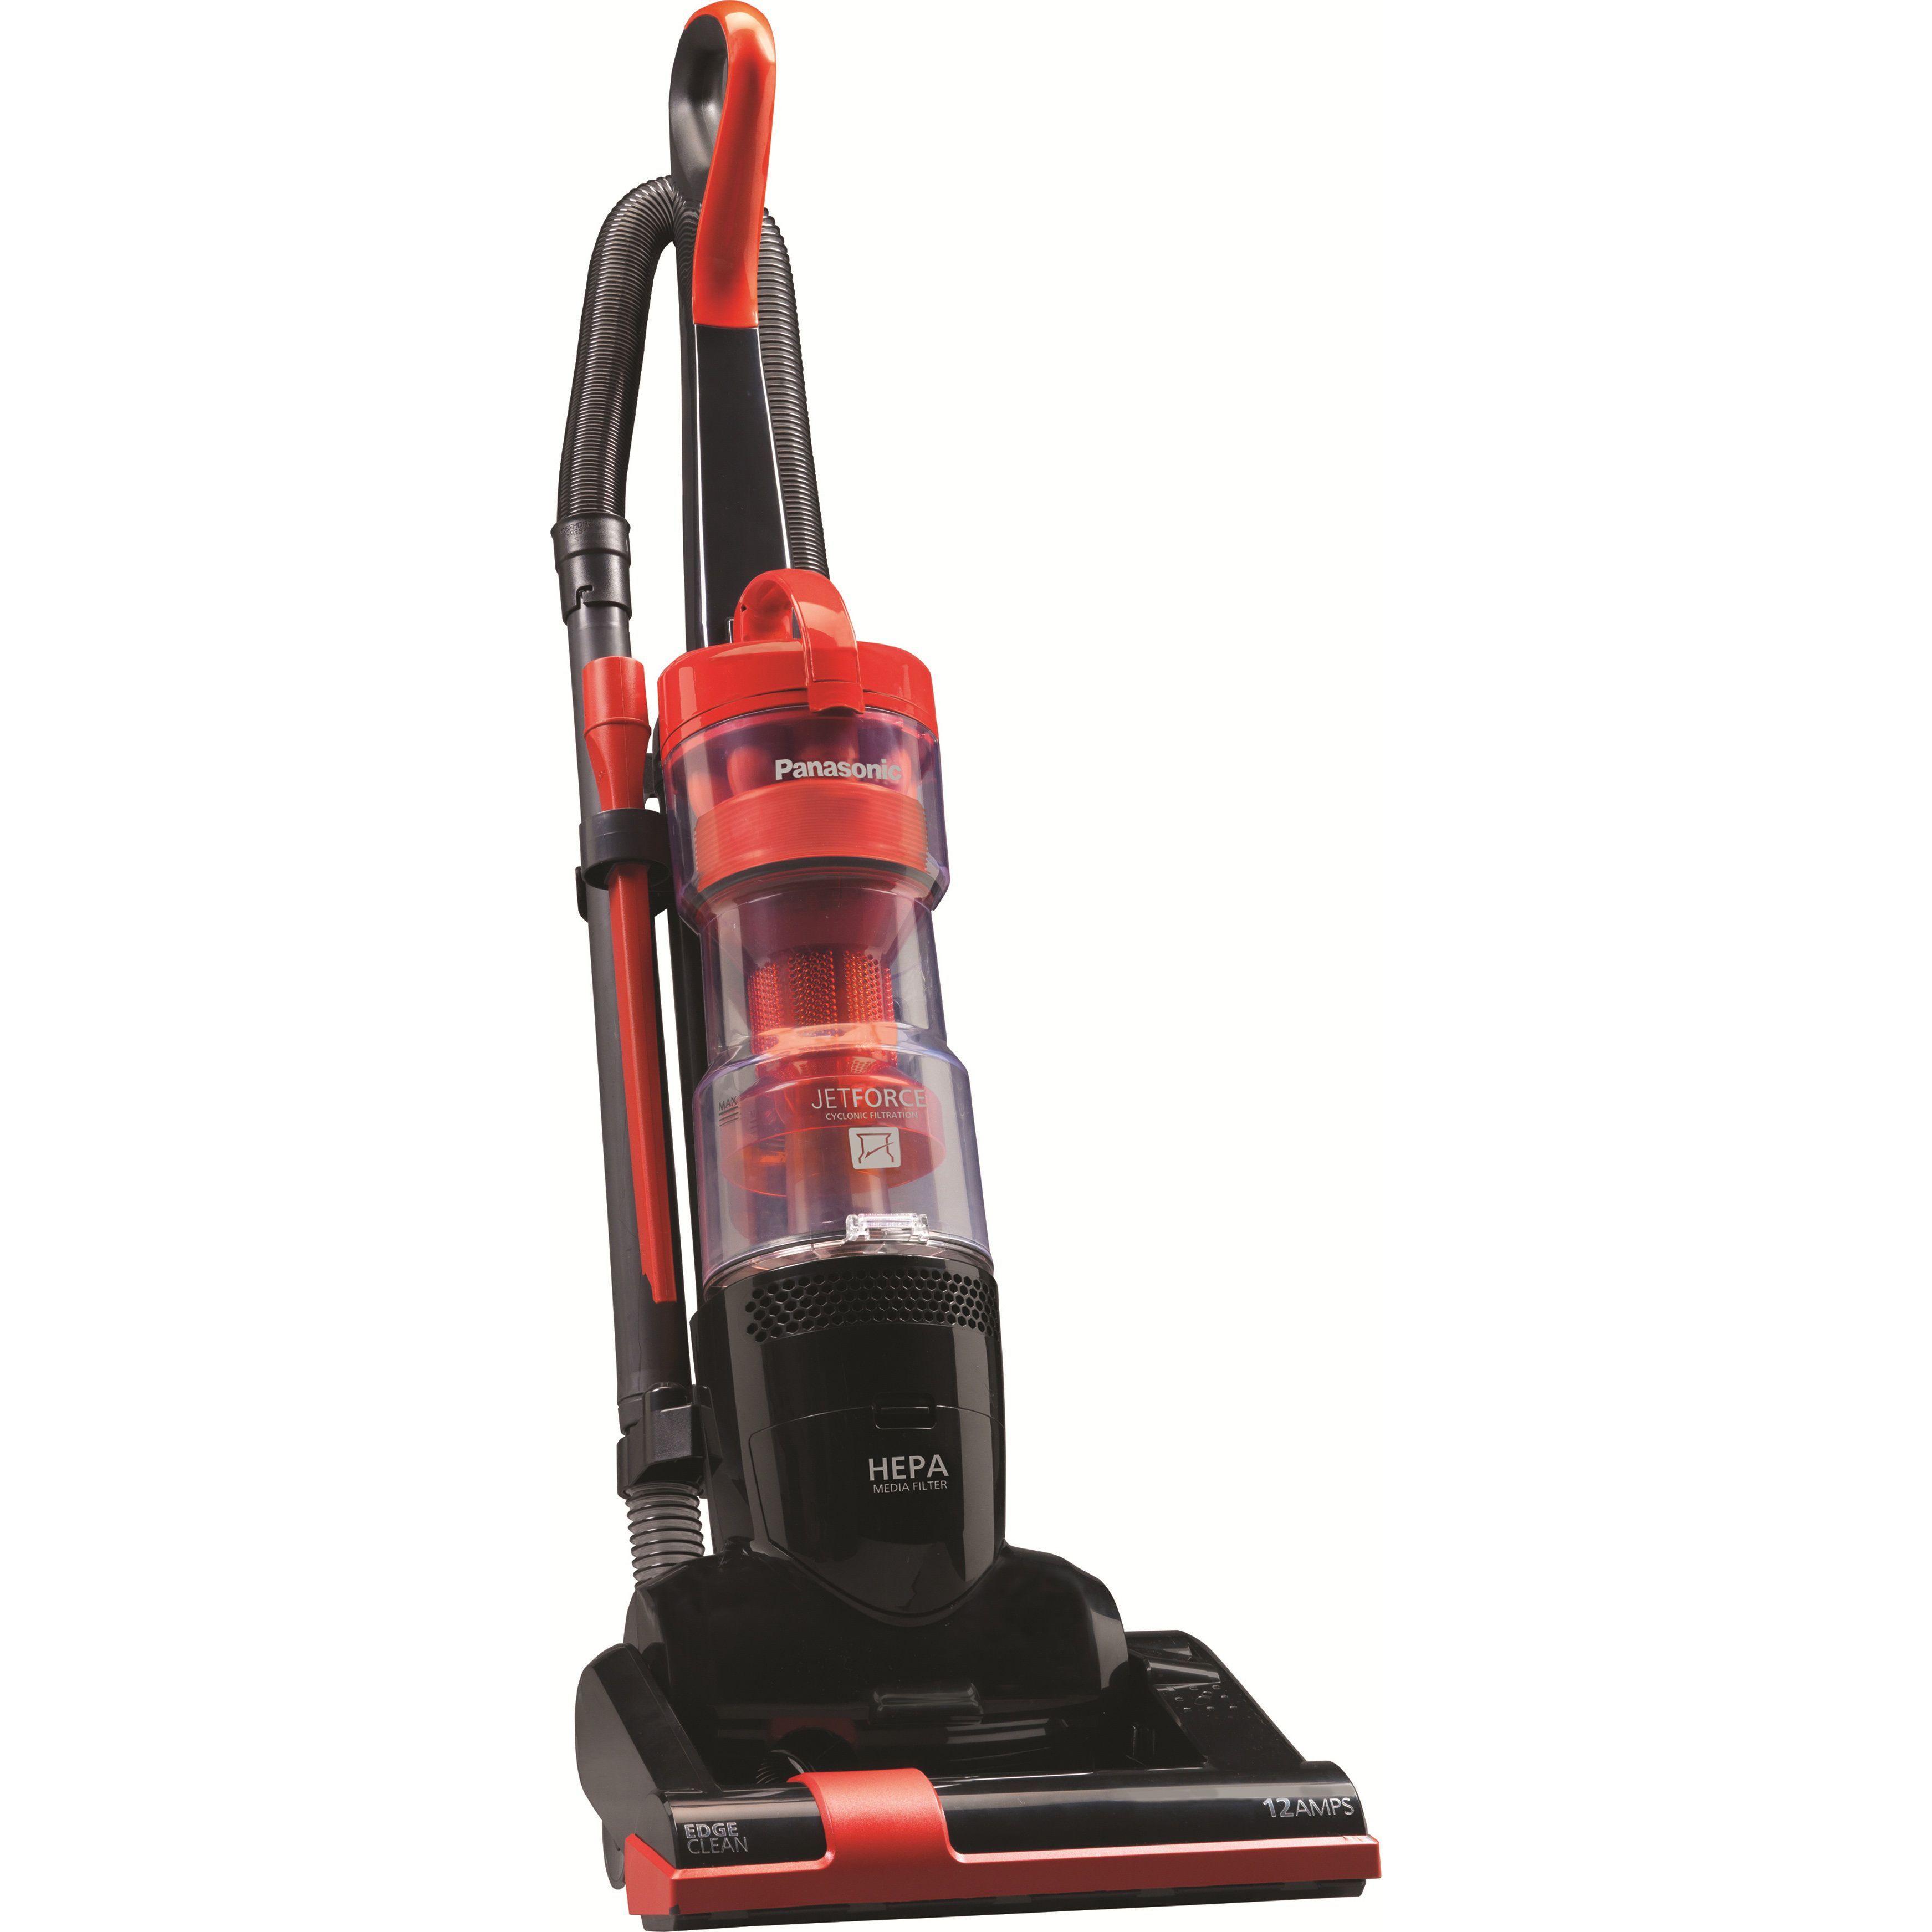 Panasonic MCUL423 Bagless Jet Force Upright Vacuum